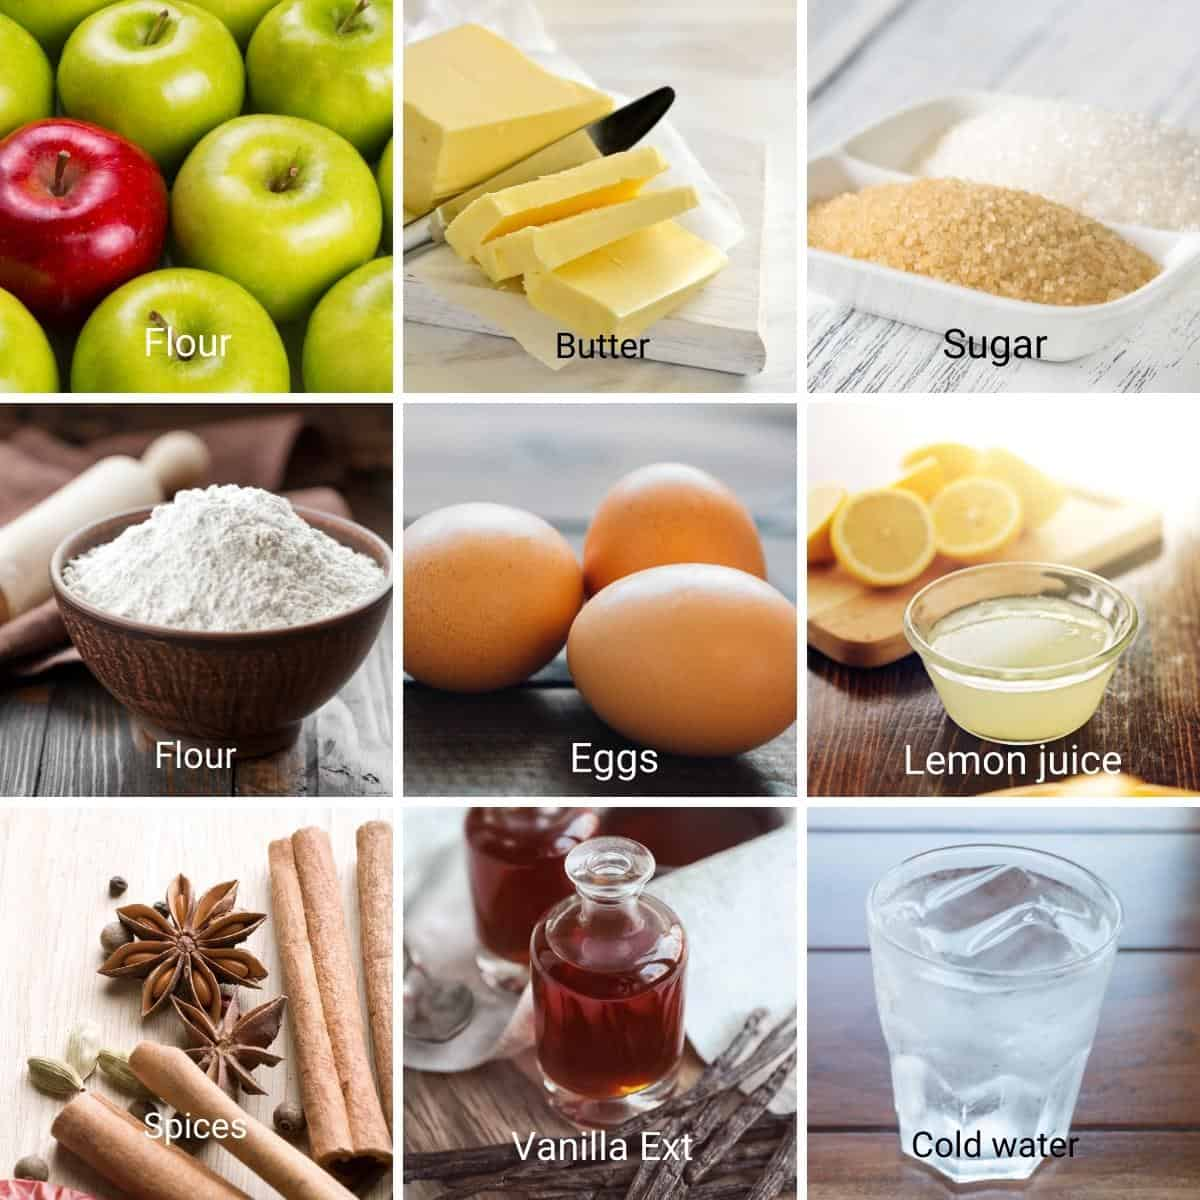 Ingredients for apple pie recipe.